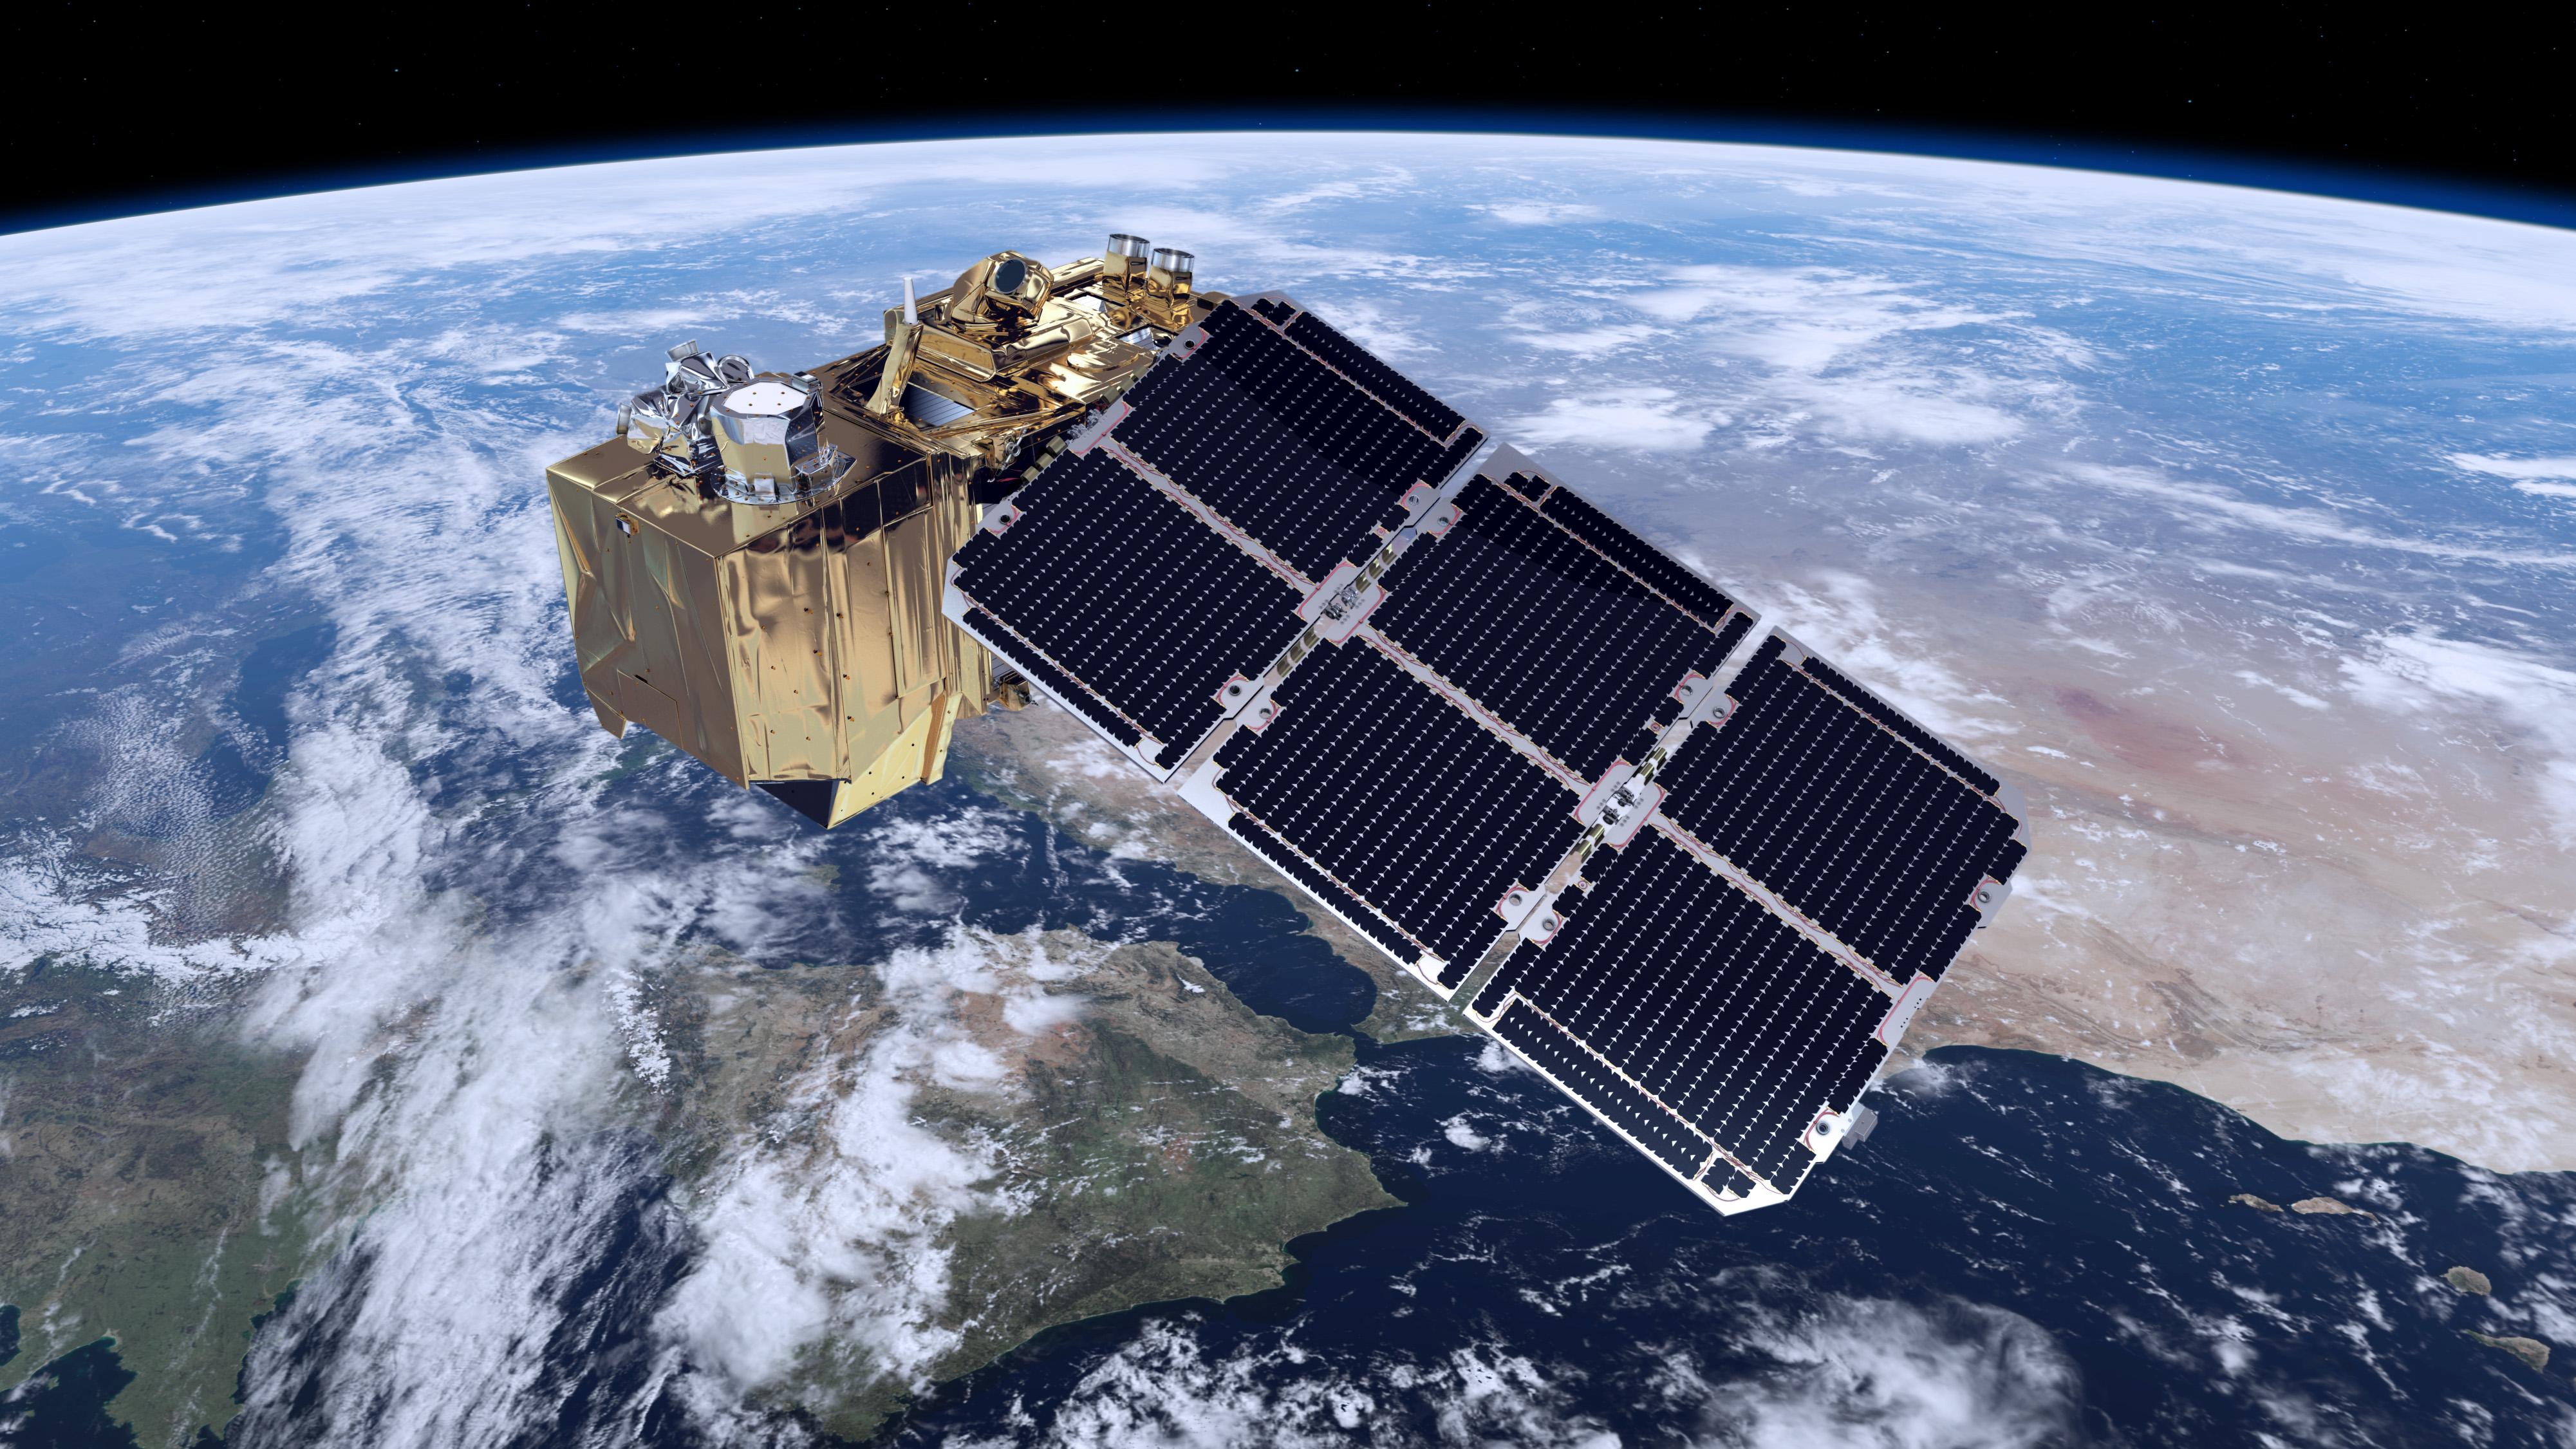 Satelita Sentinel 2 na orbicie. ESA/ATG medialab 2014